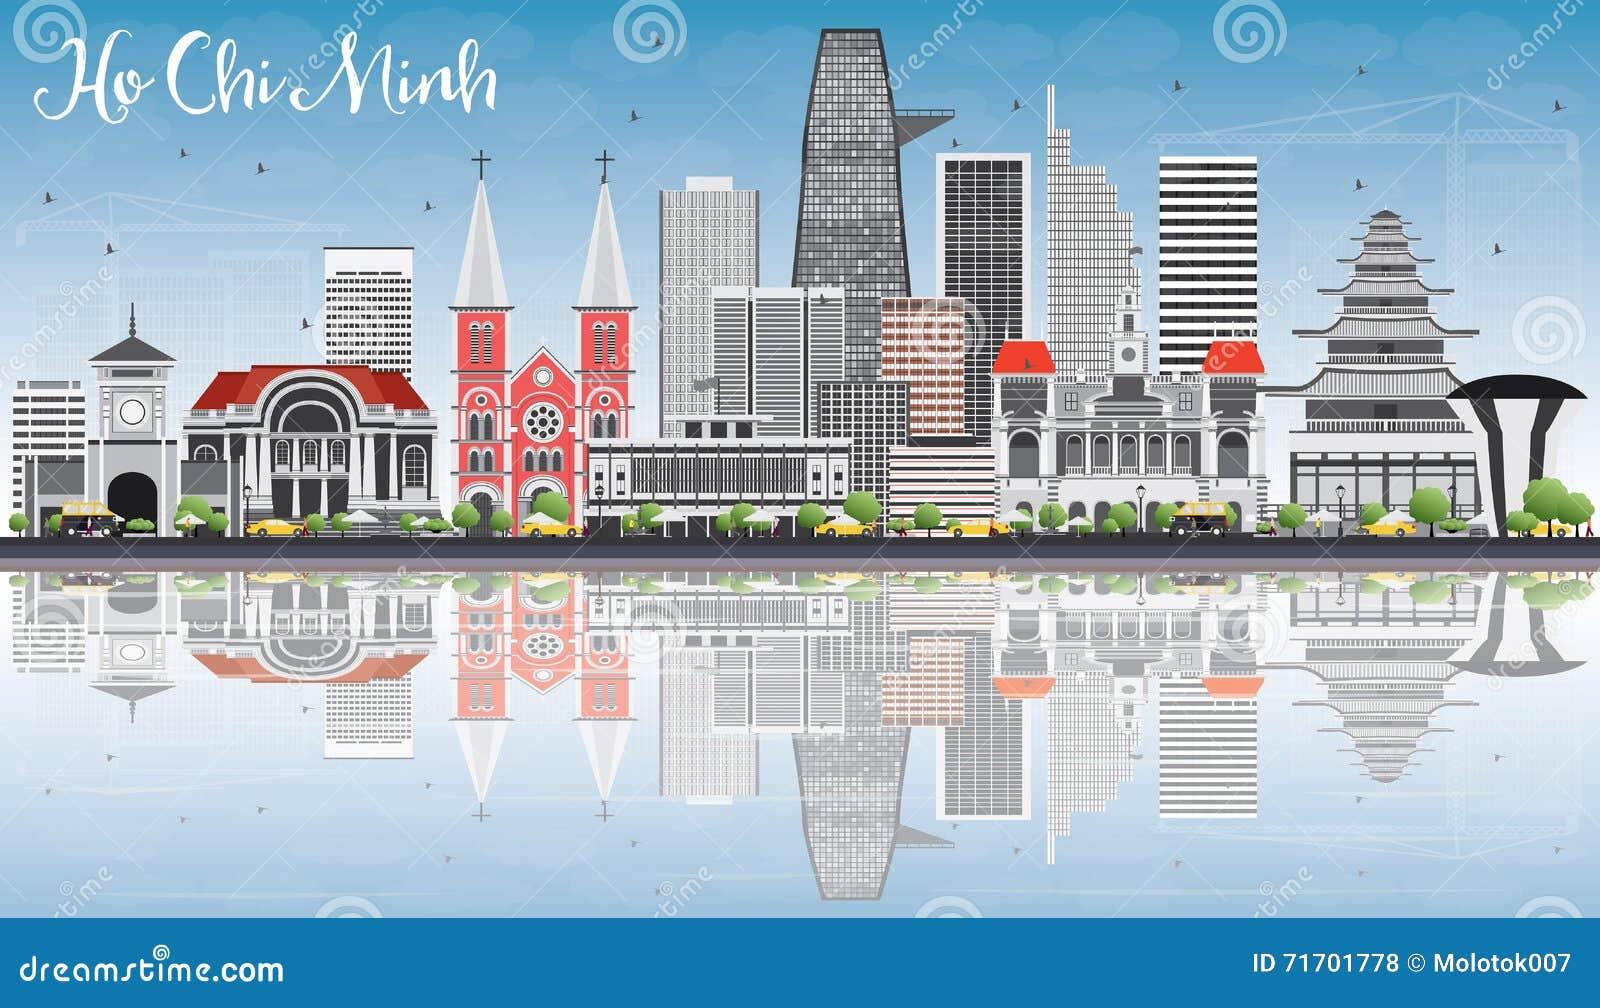 Blue Sky Travel Ho Chi Minh City